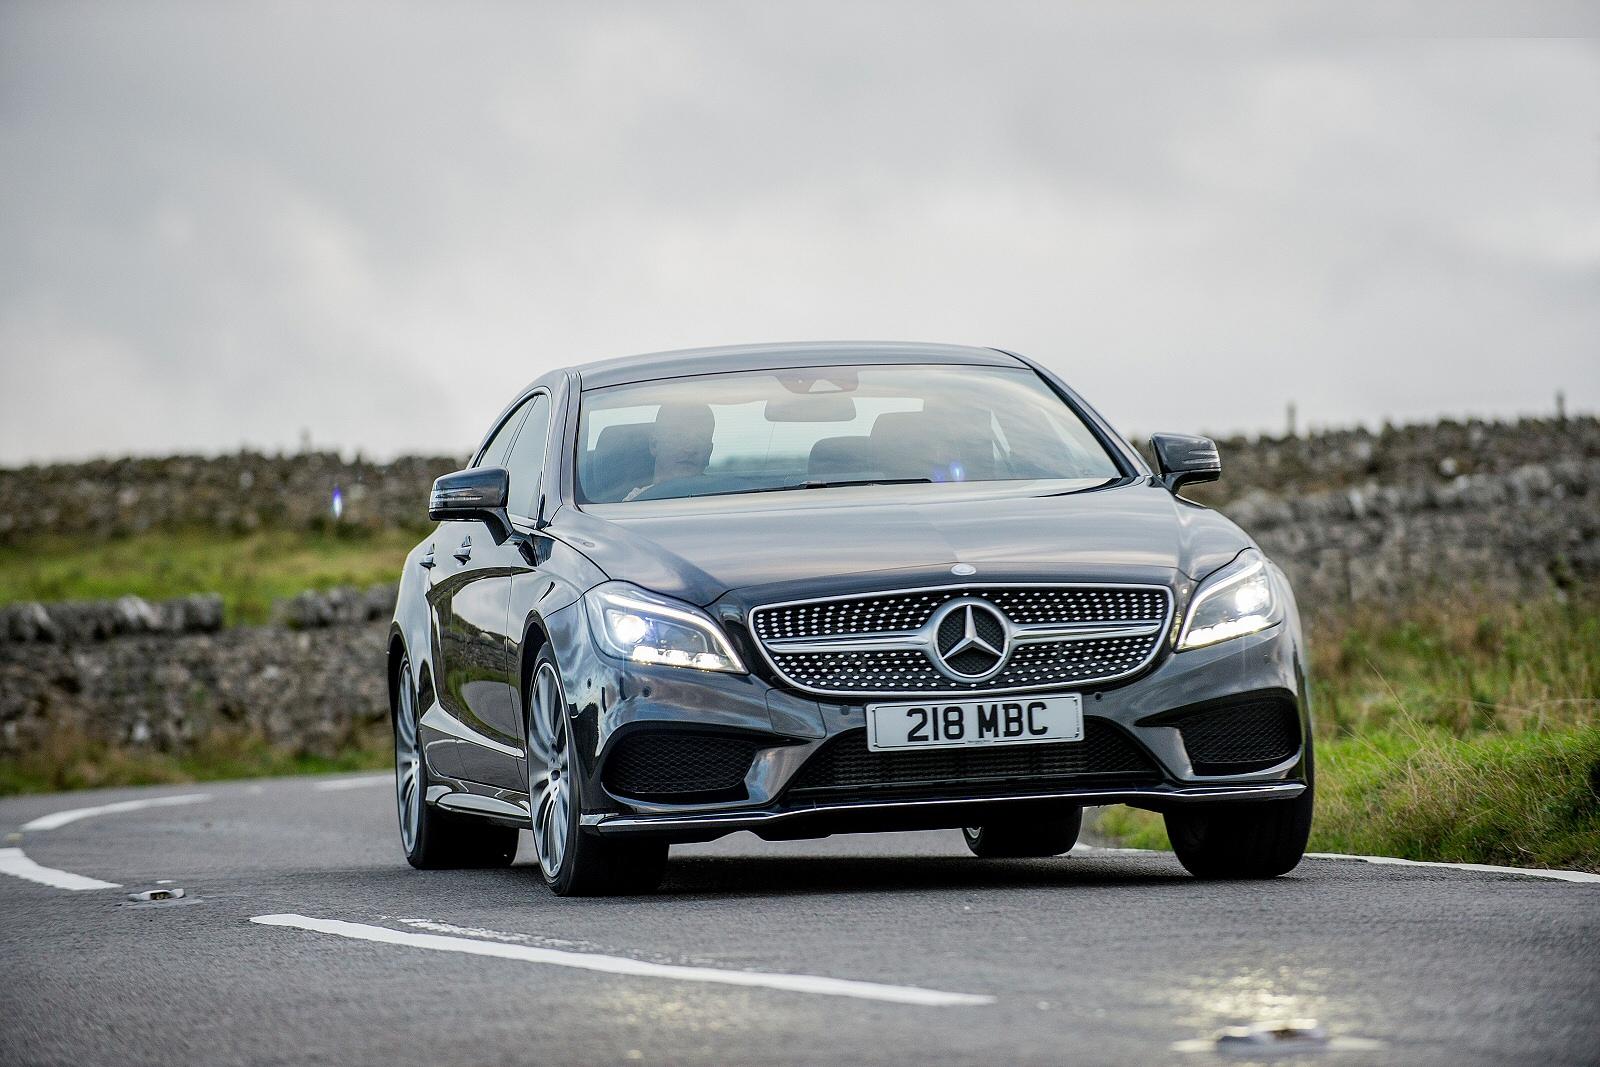 Mercedes benz cls coupe lease mercedes benz cls finance for Mercedes benz cls lease